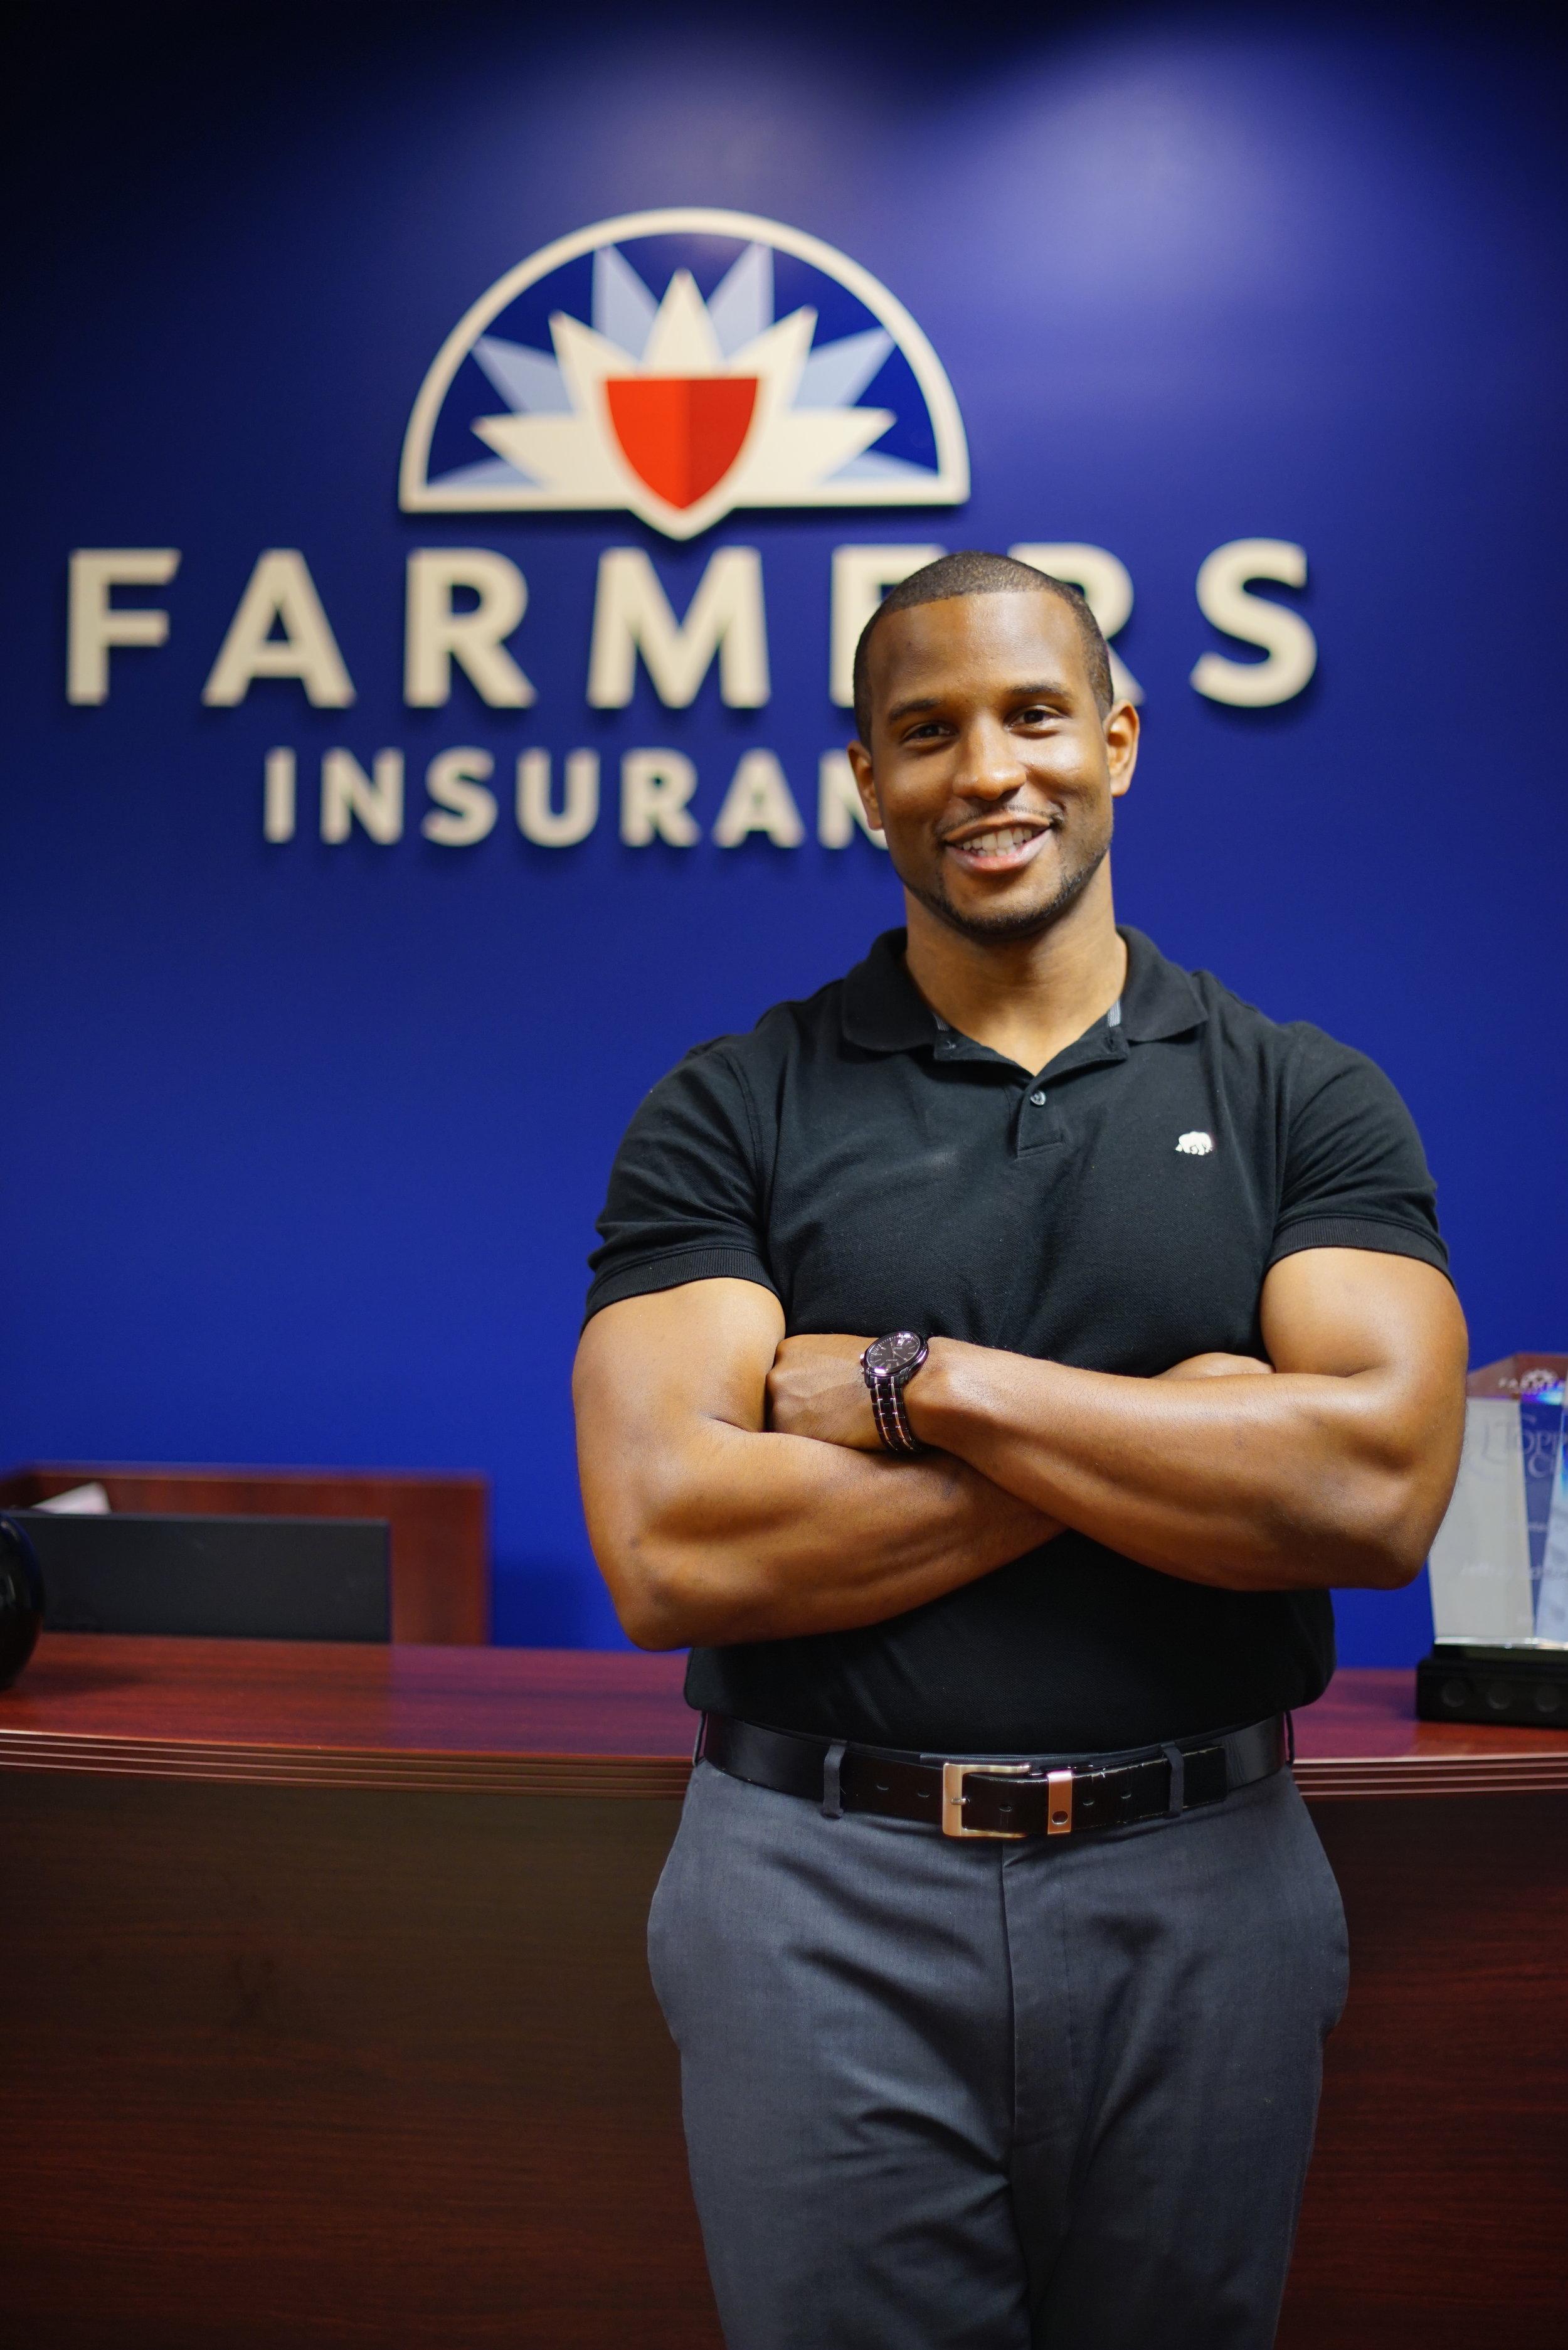 Farmers Insurance Working Portraits